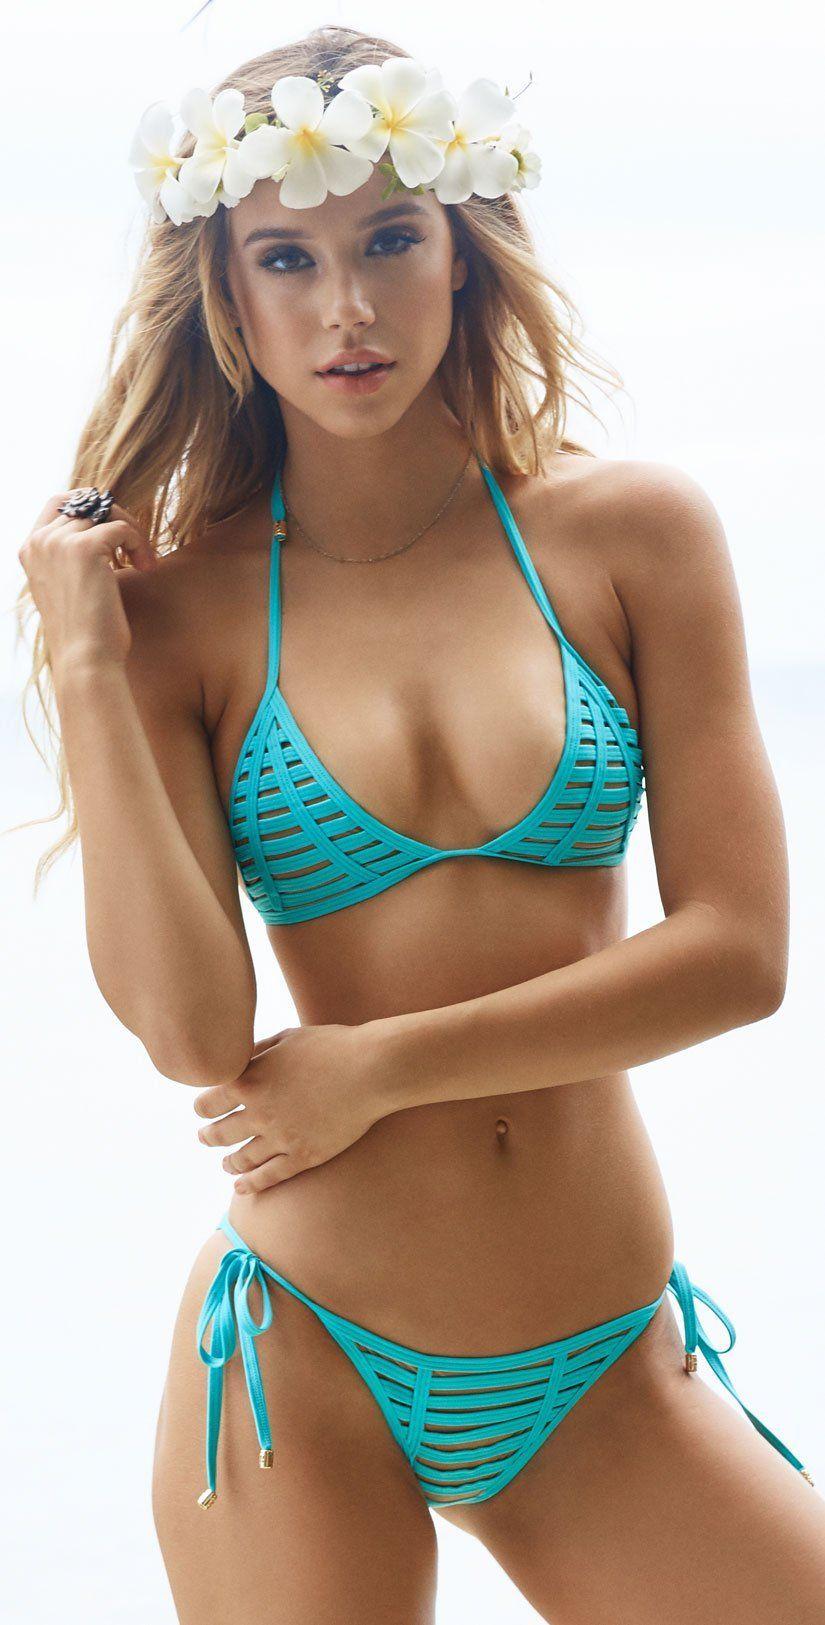 En Hermosas Y BikiniHot BikiniMujeres Mas Chicas Las 5R4LAjq3